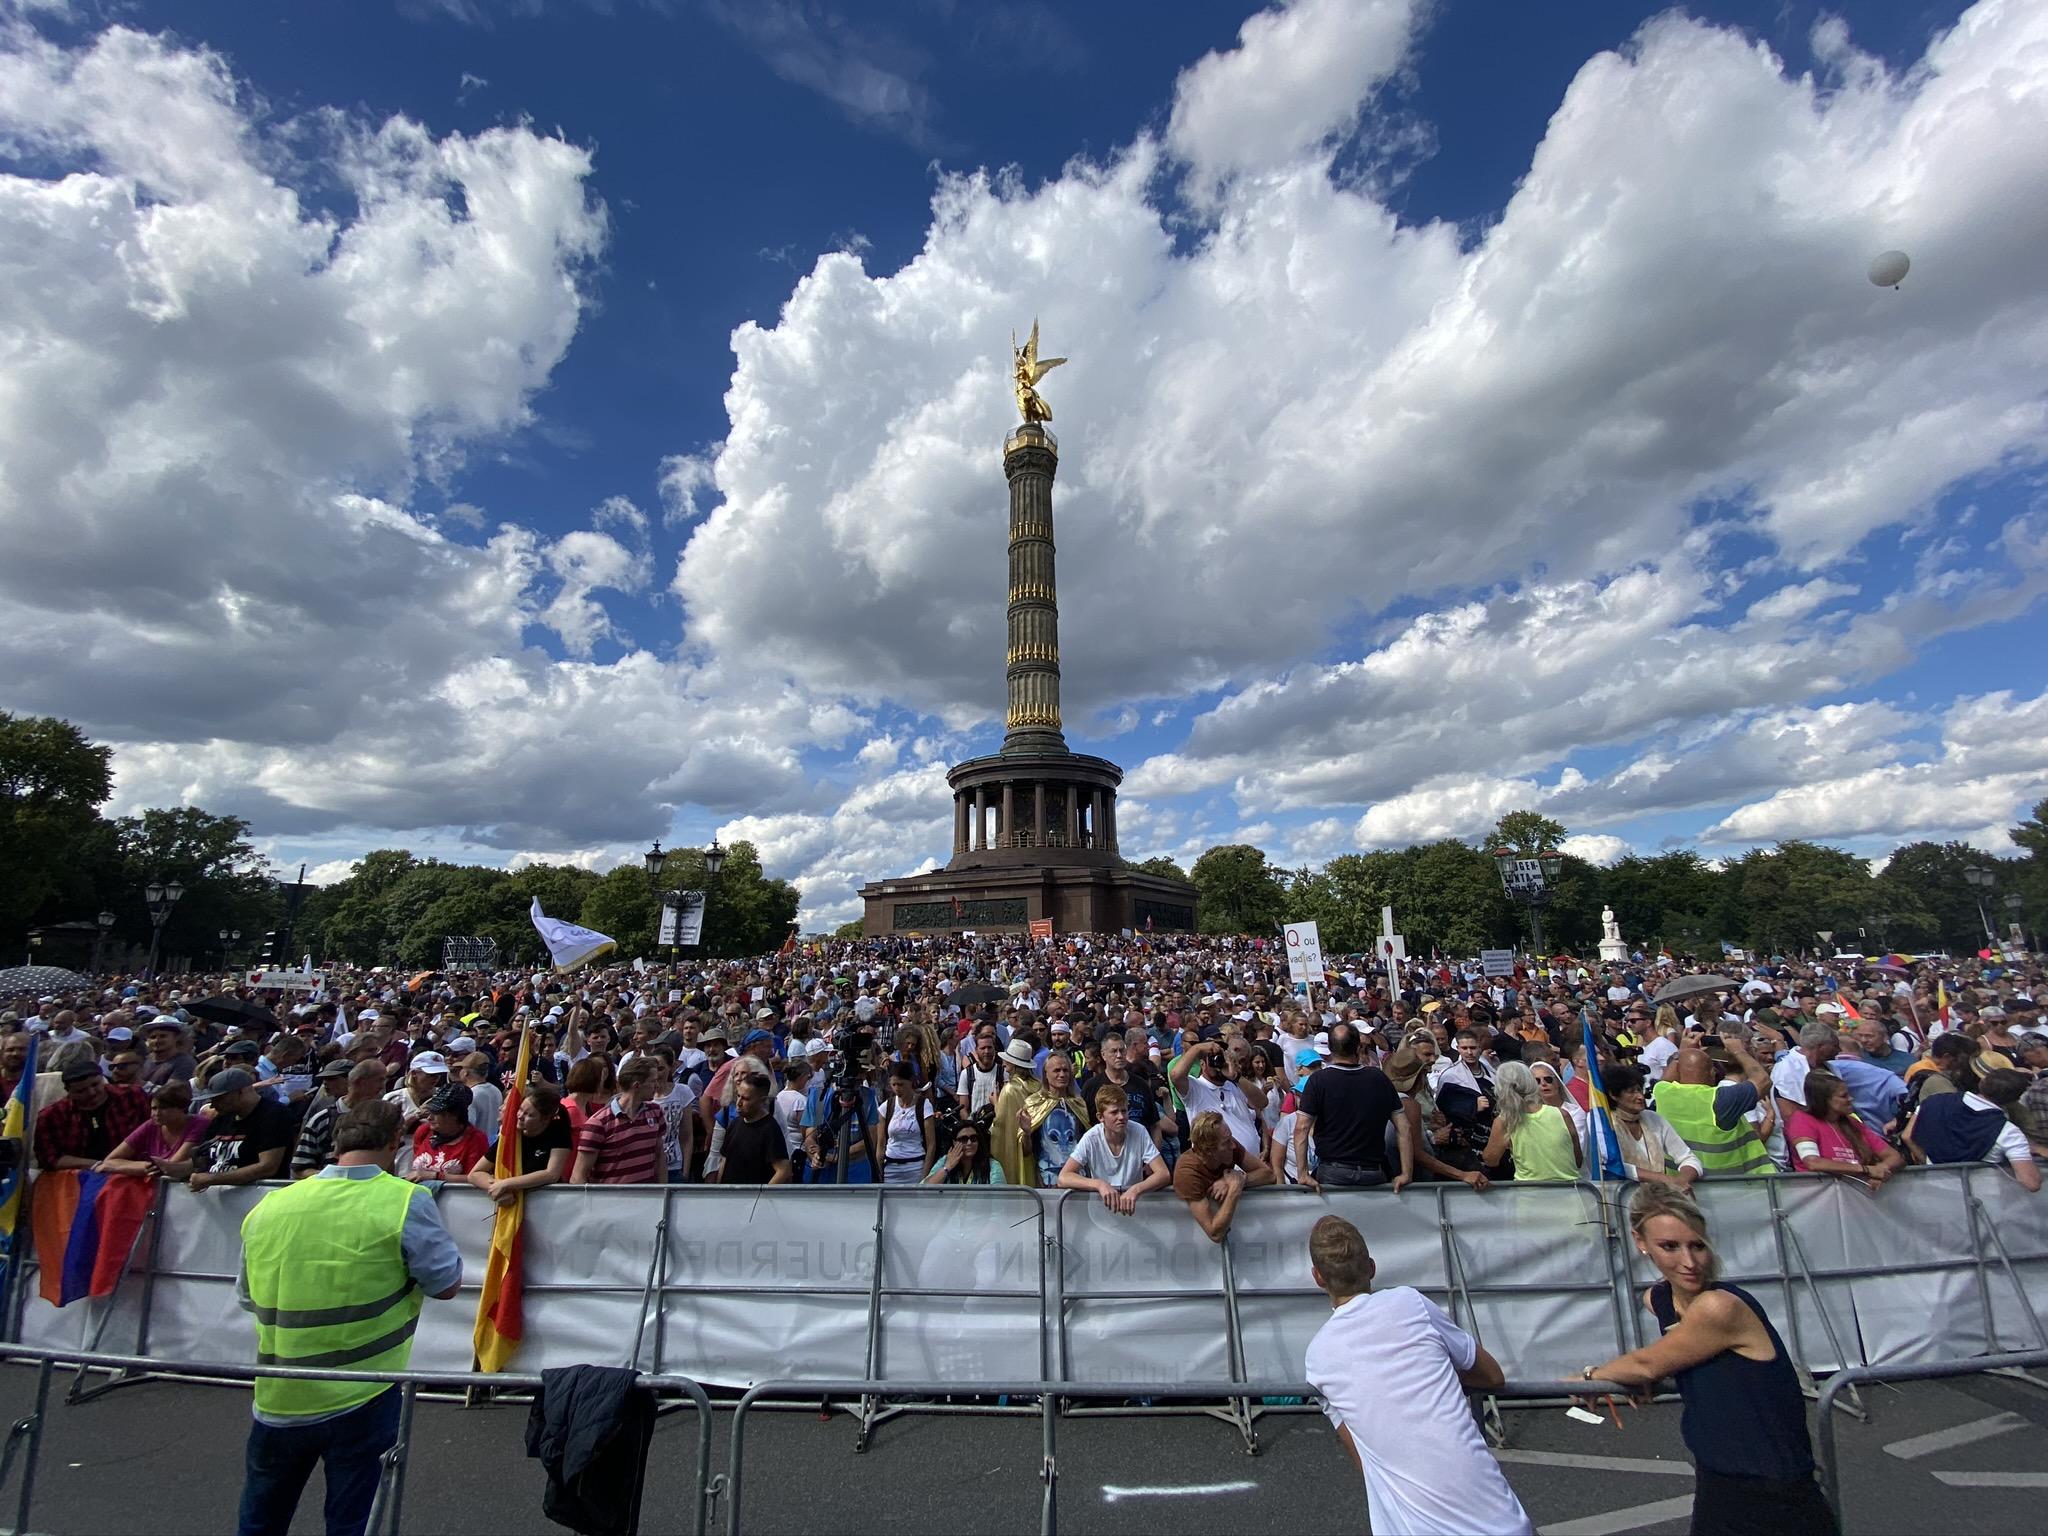 Nach Teilnahme an Demo Corona-Test verweigert: Reinigungskraft wird fristlos entlassen